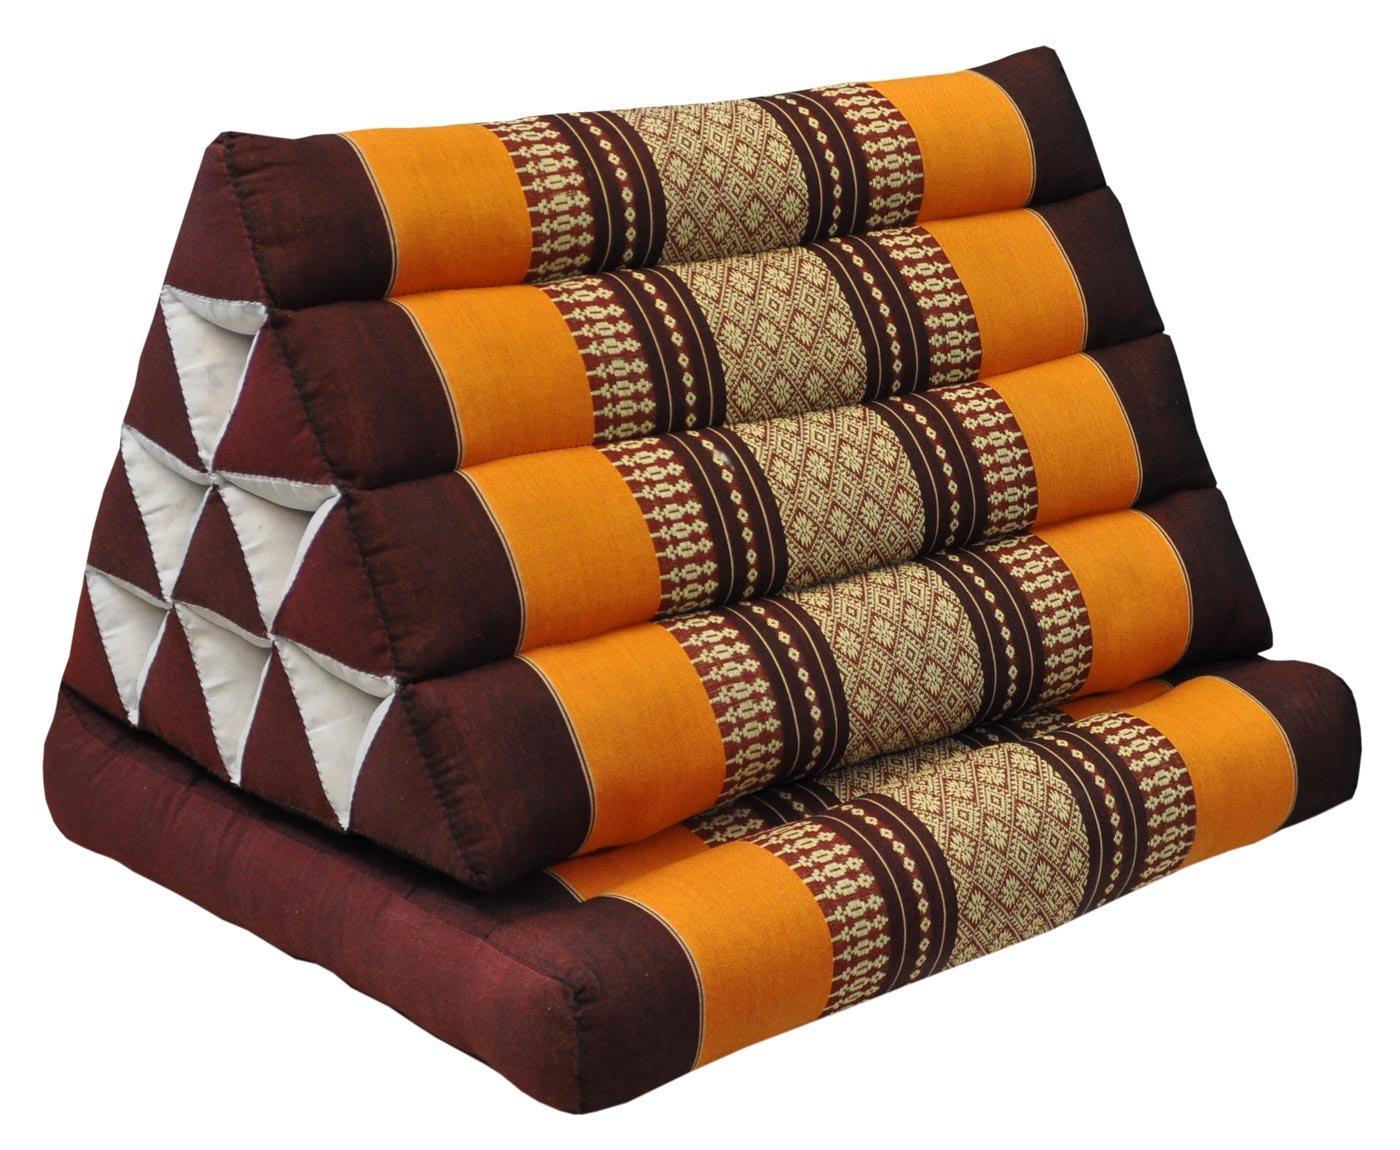 Thai triangle cushion with 1 folding seat, brown/orange, relaxation, beach, pool, meditation, yoga, (81101)